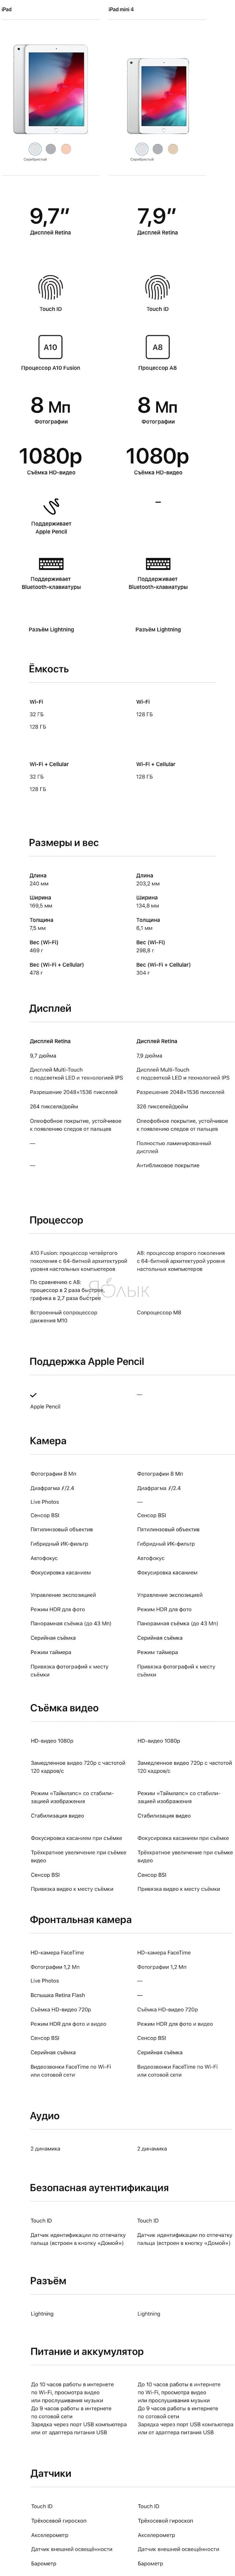 Подробное сравнение iPad (2018) и iPad mini 4